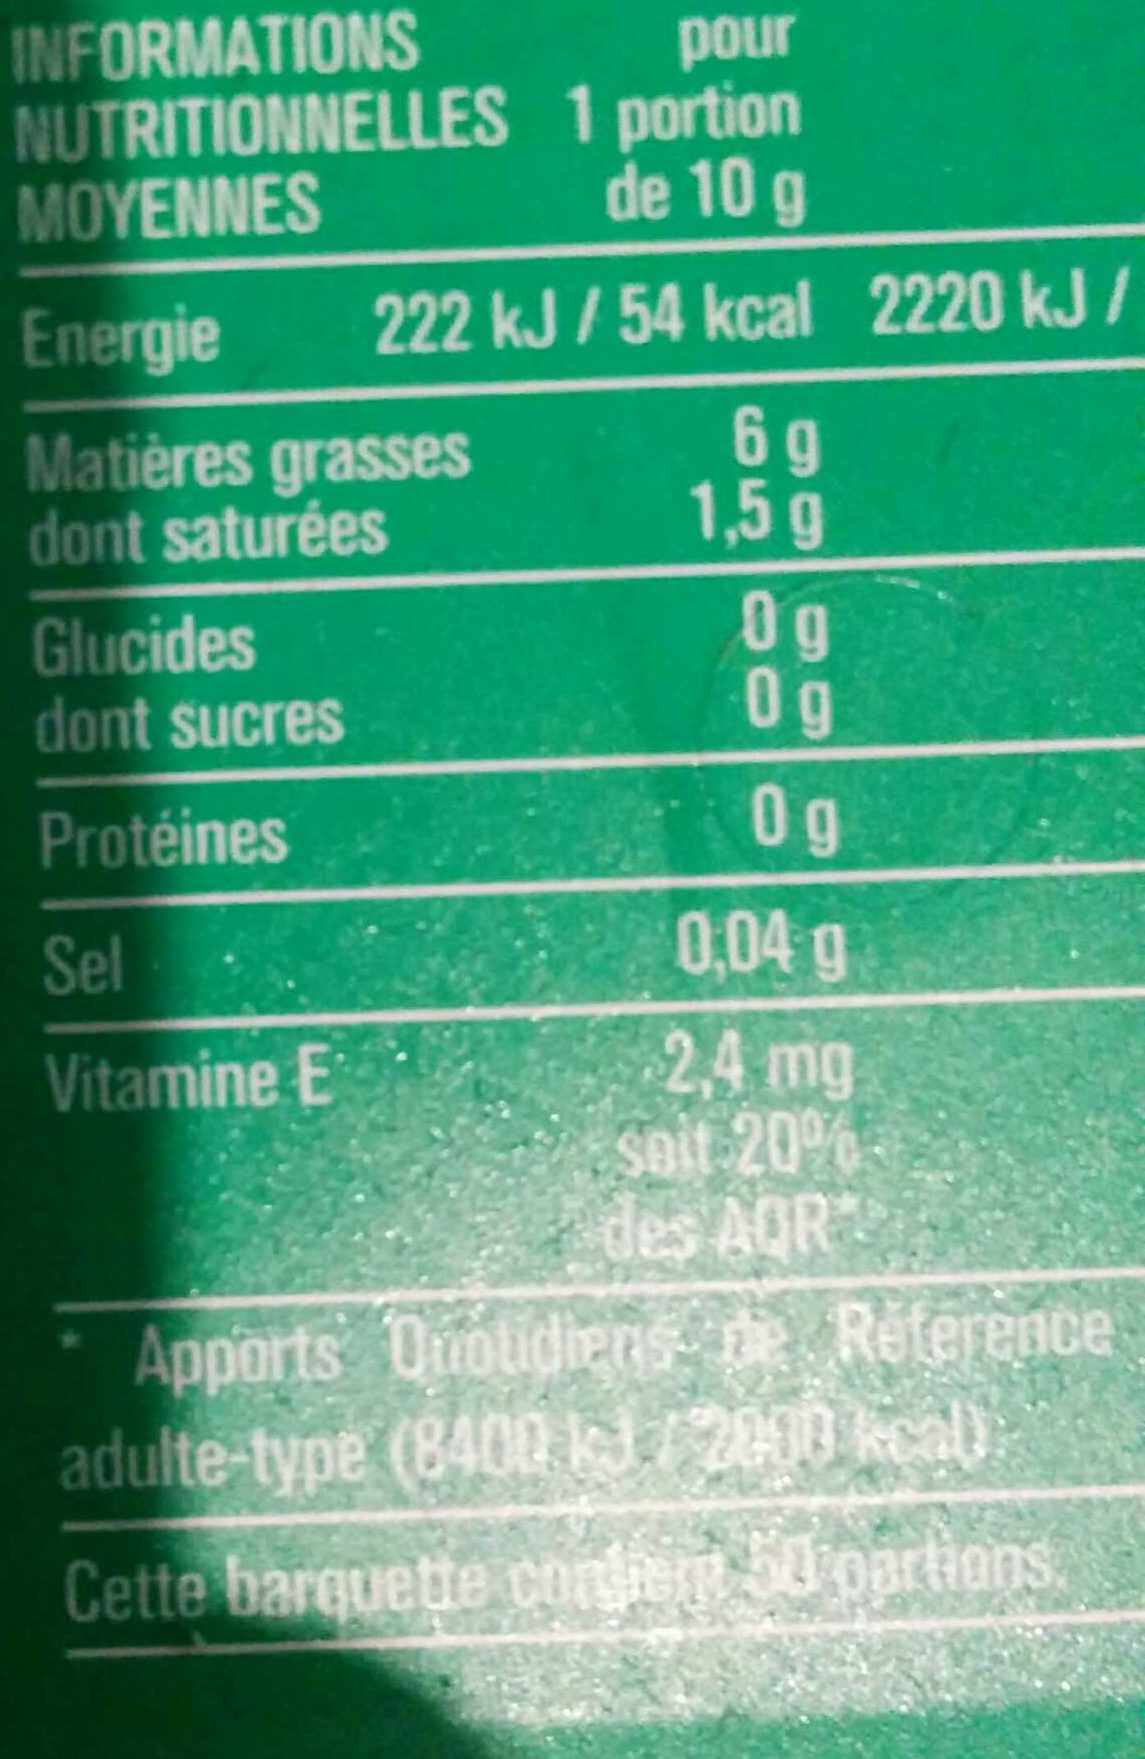 Cuisson et Tartine 60% MG - Voedingswaarden - fr